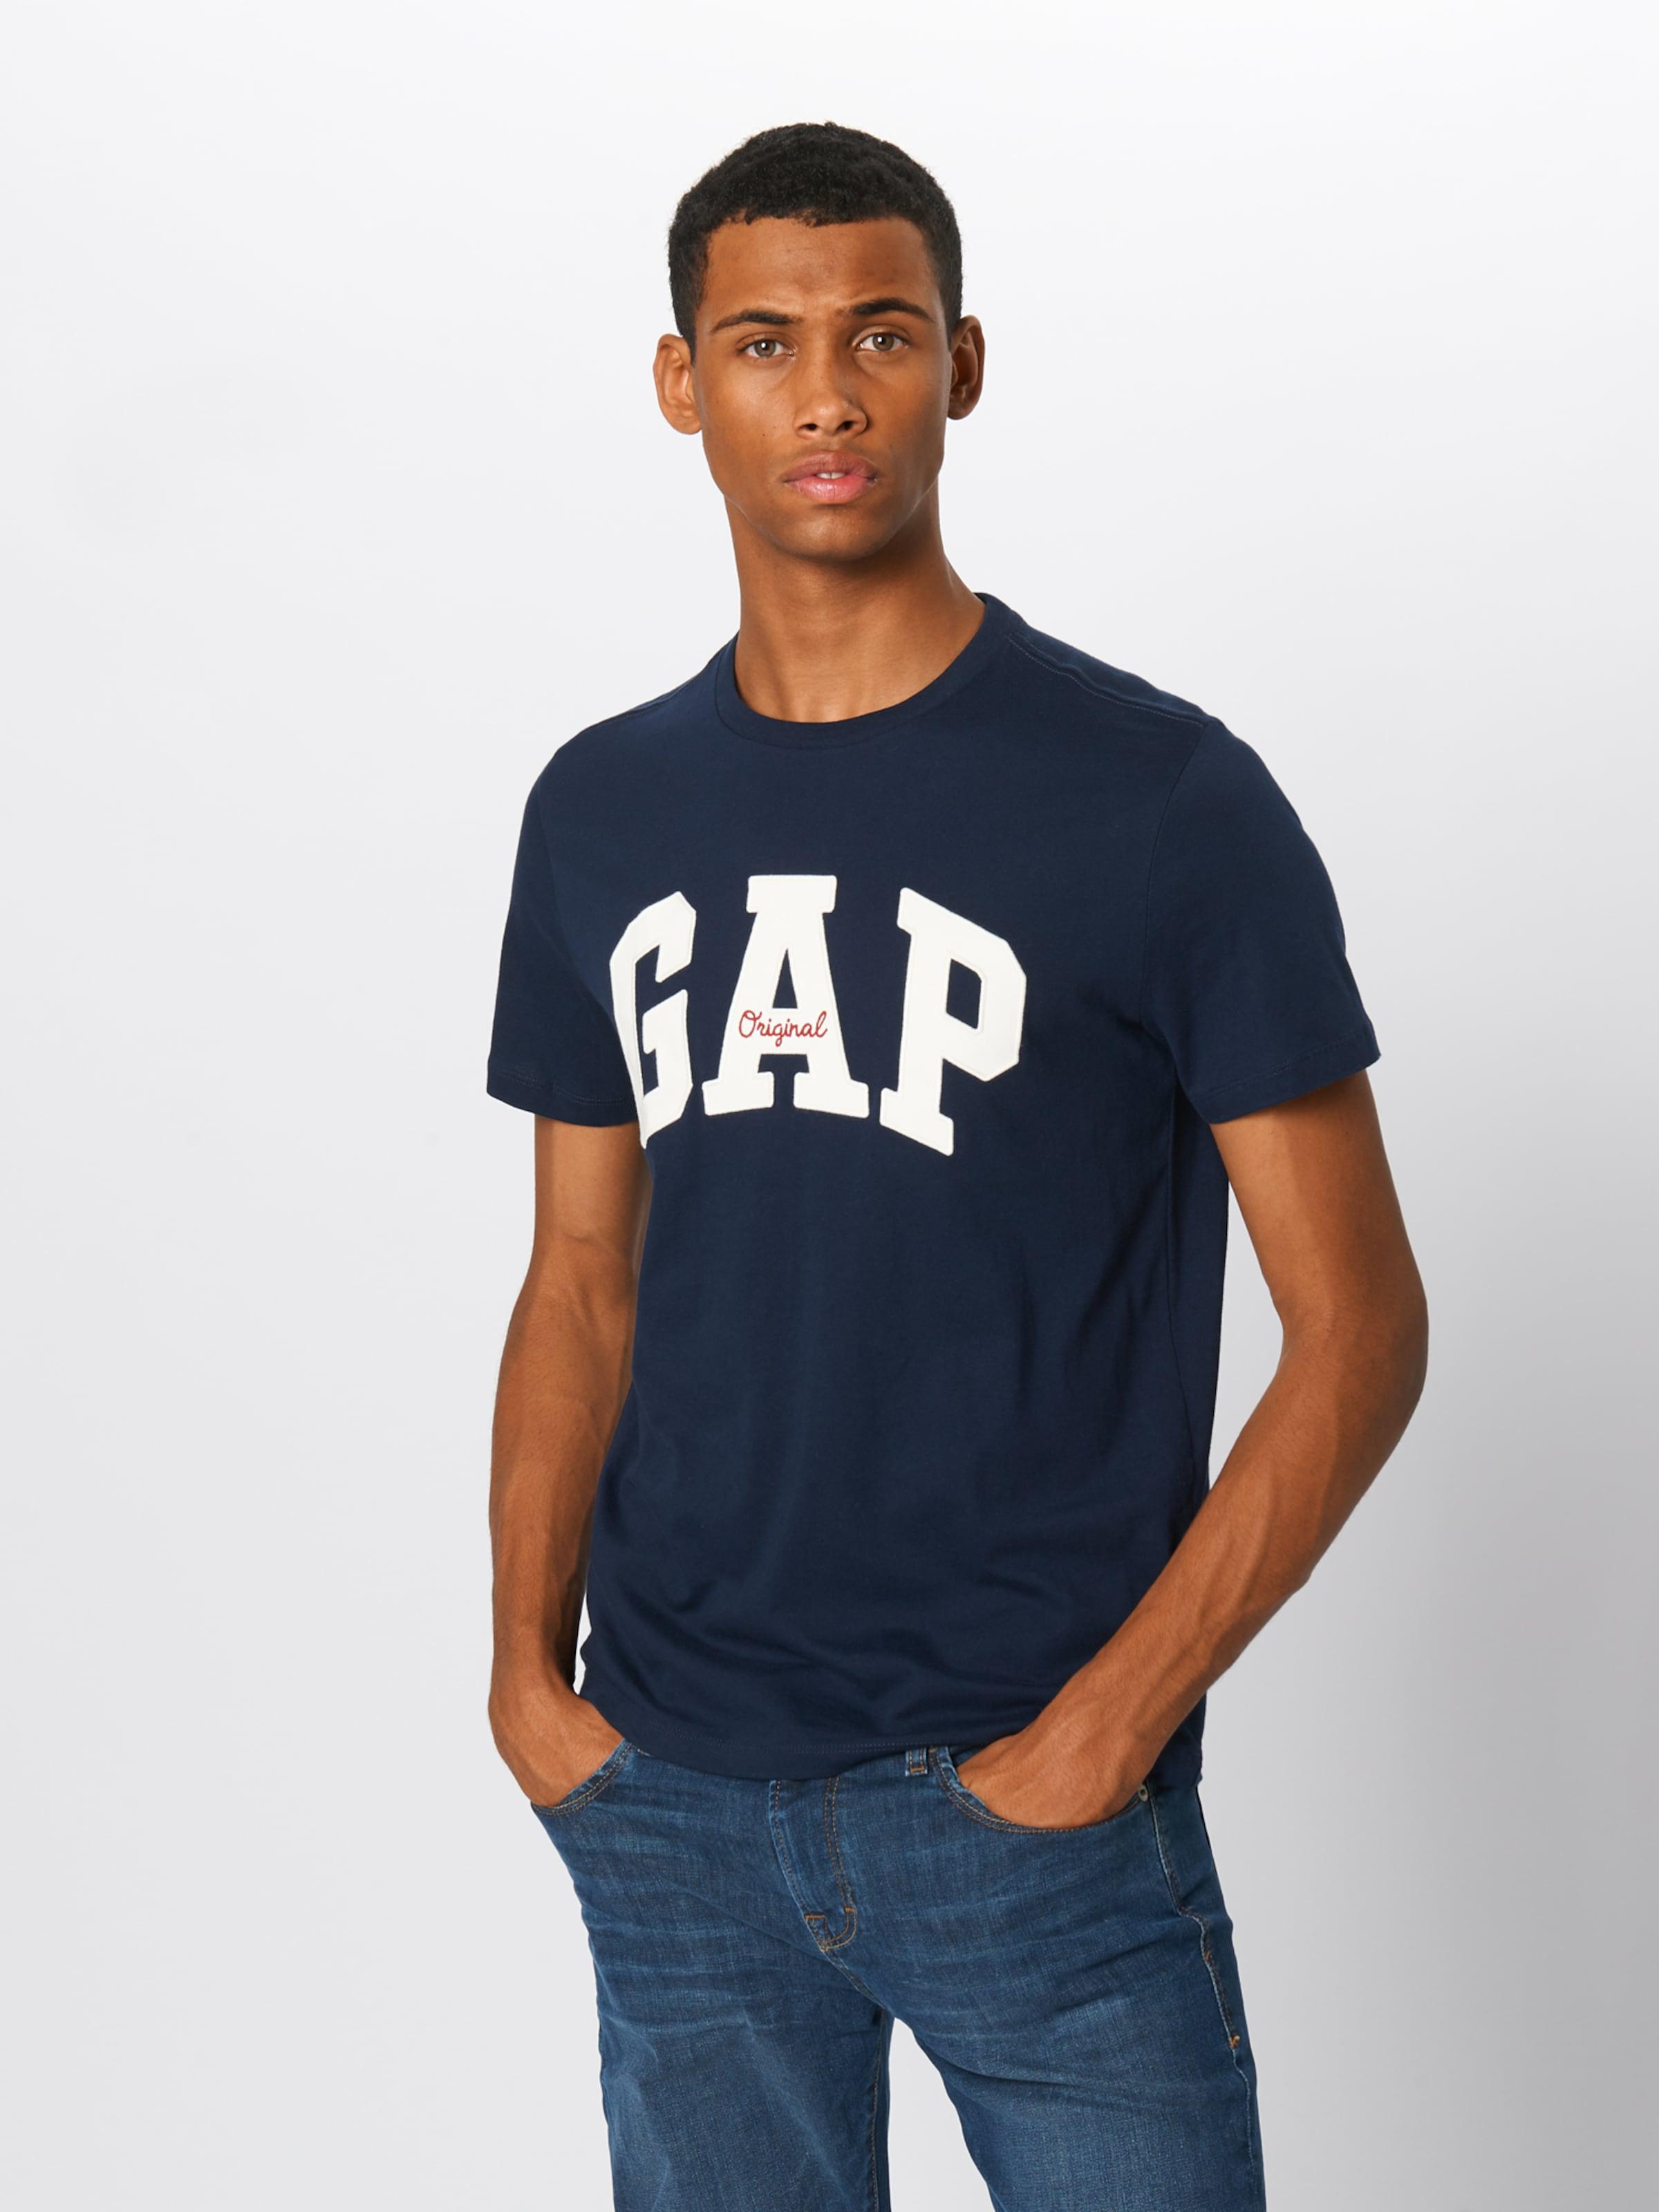 Shirt Shirt 'arch' Shirt In In NavyWeiß Gap Gap Gap 'arch' NavyWeiß 'arch' kZuXOPi